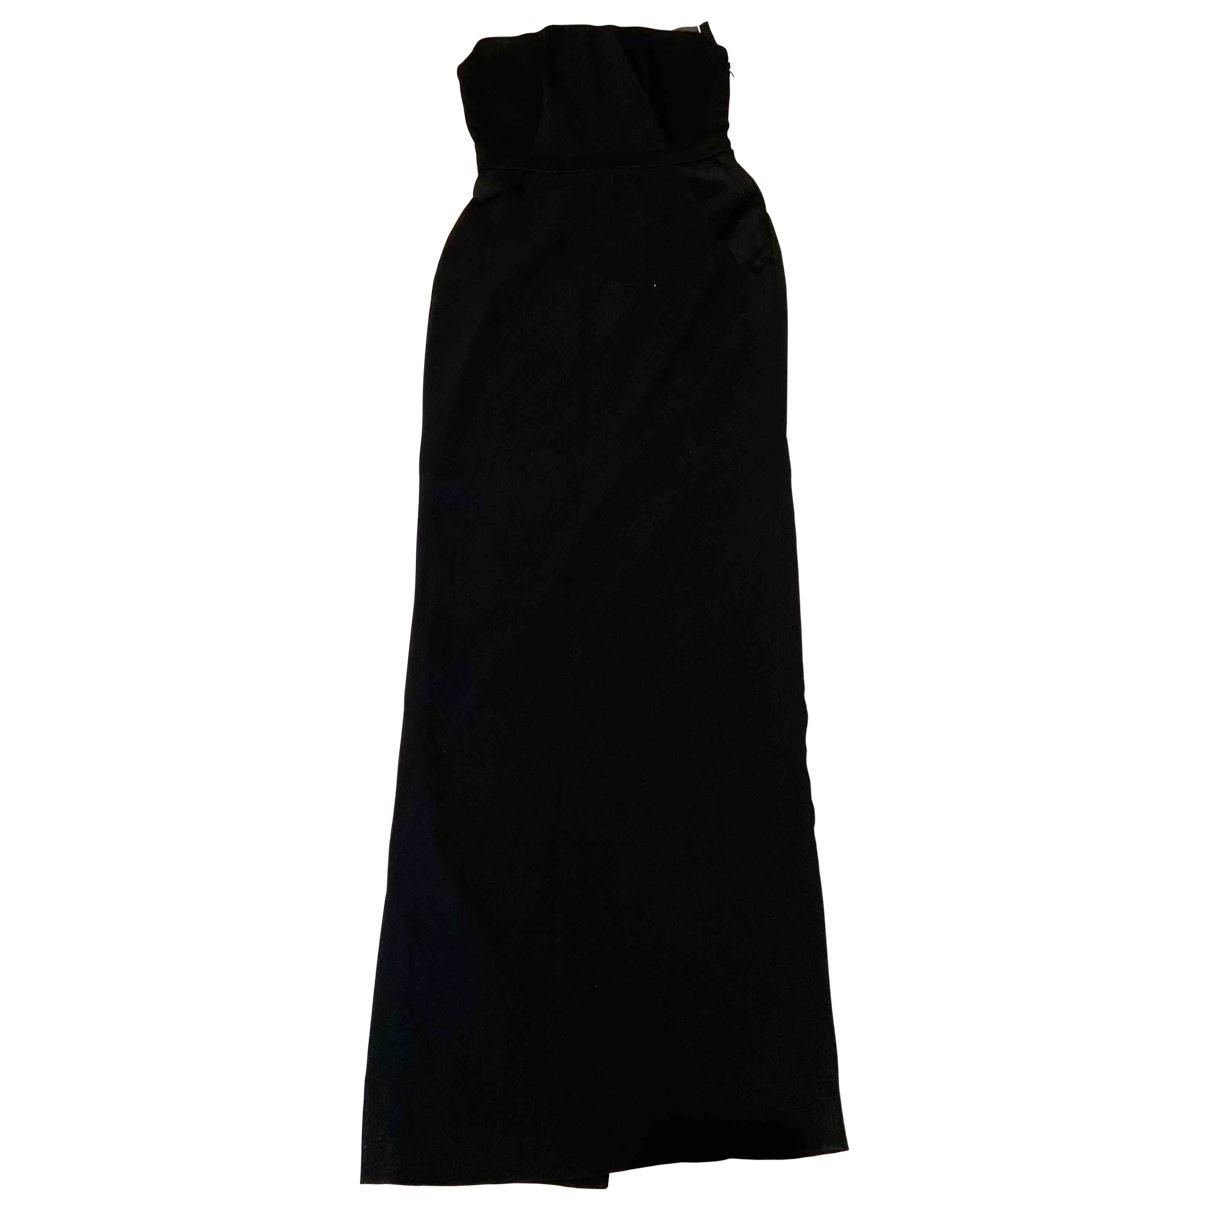 Genny \N Black dress for Women 42 FR